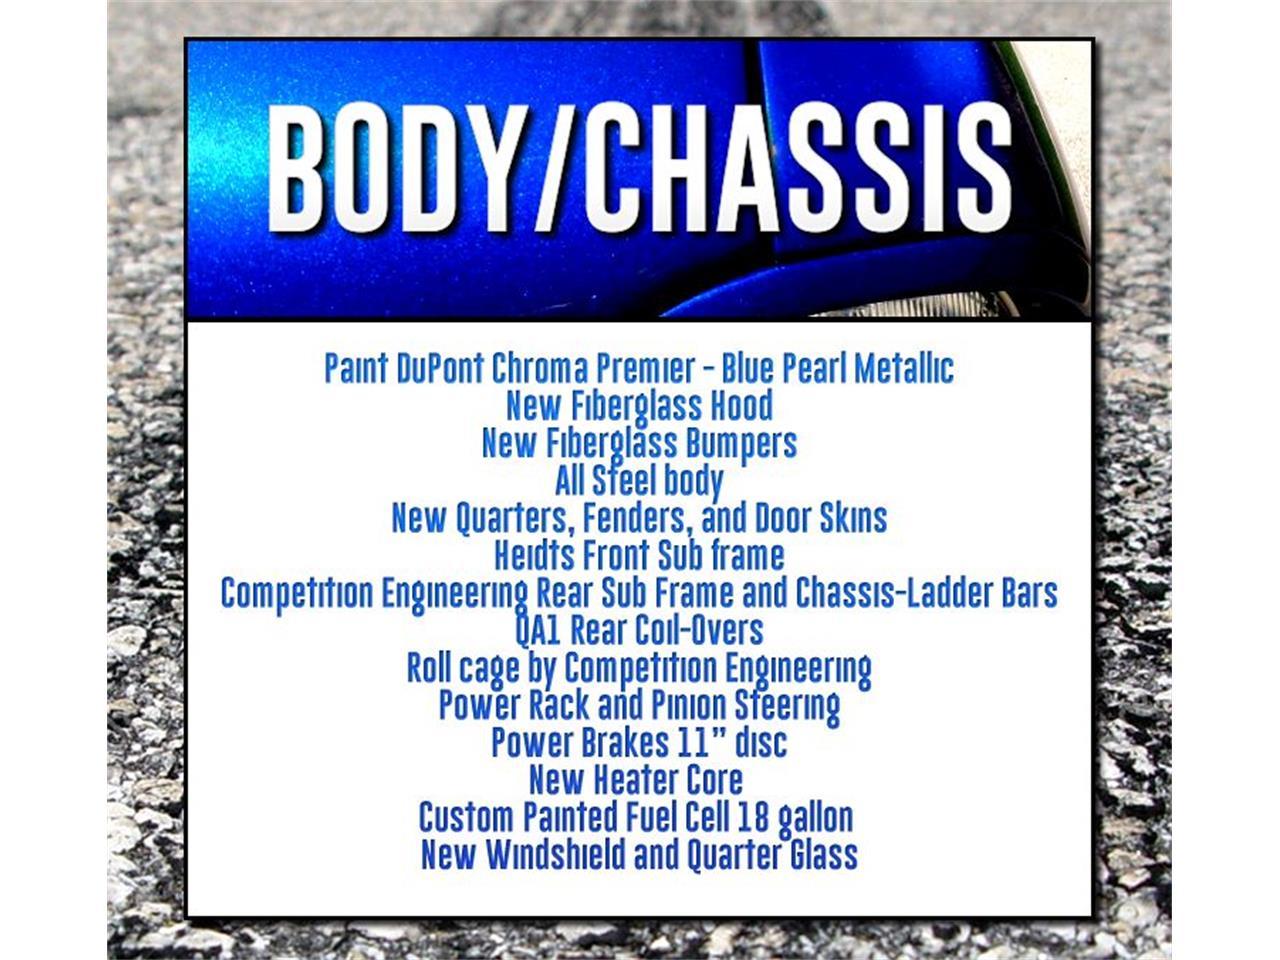 For Sale: 1964 Chevrolet Chevy II Nova in Arlington, Texas